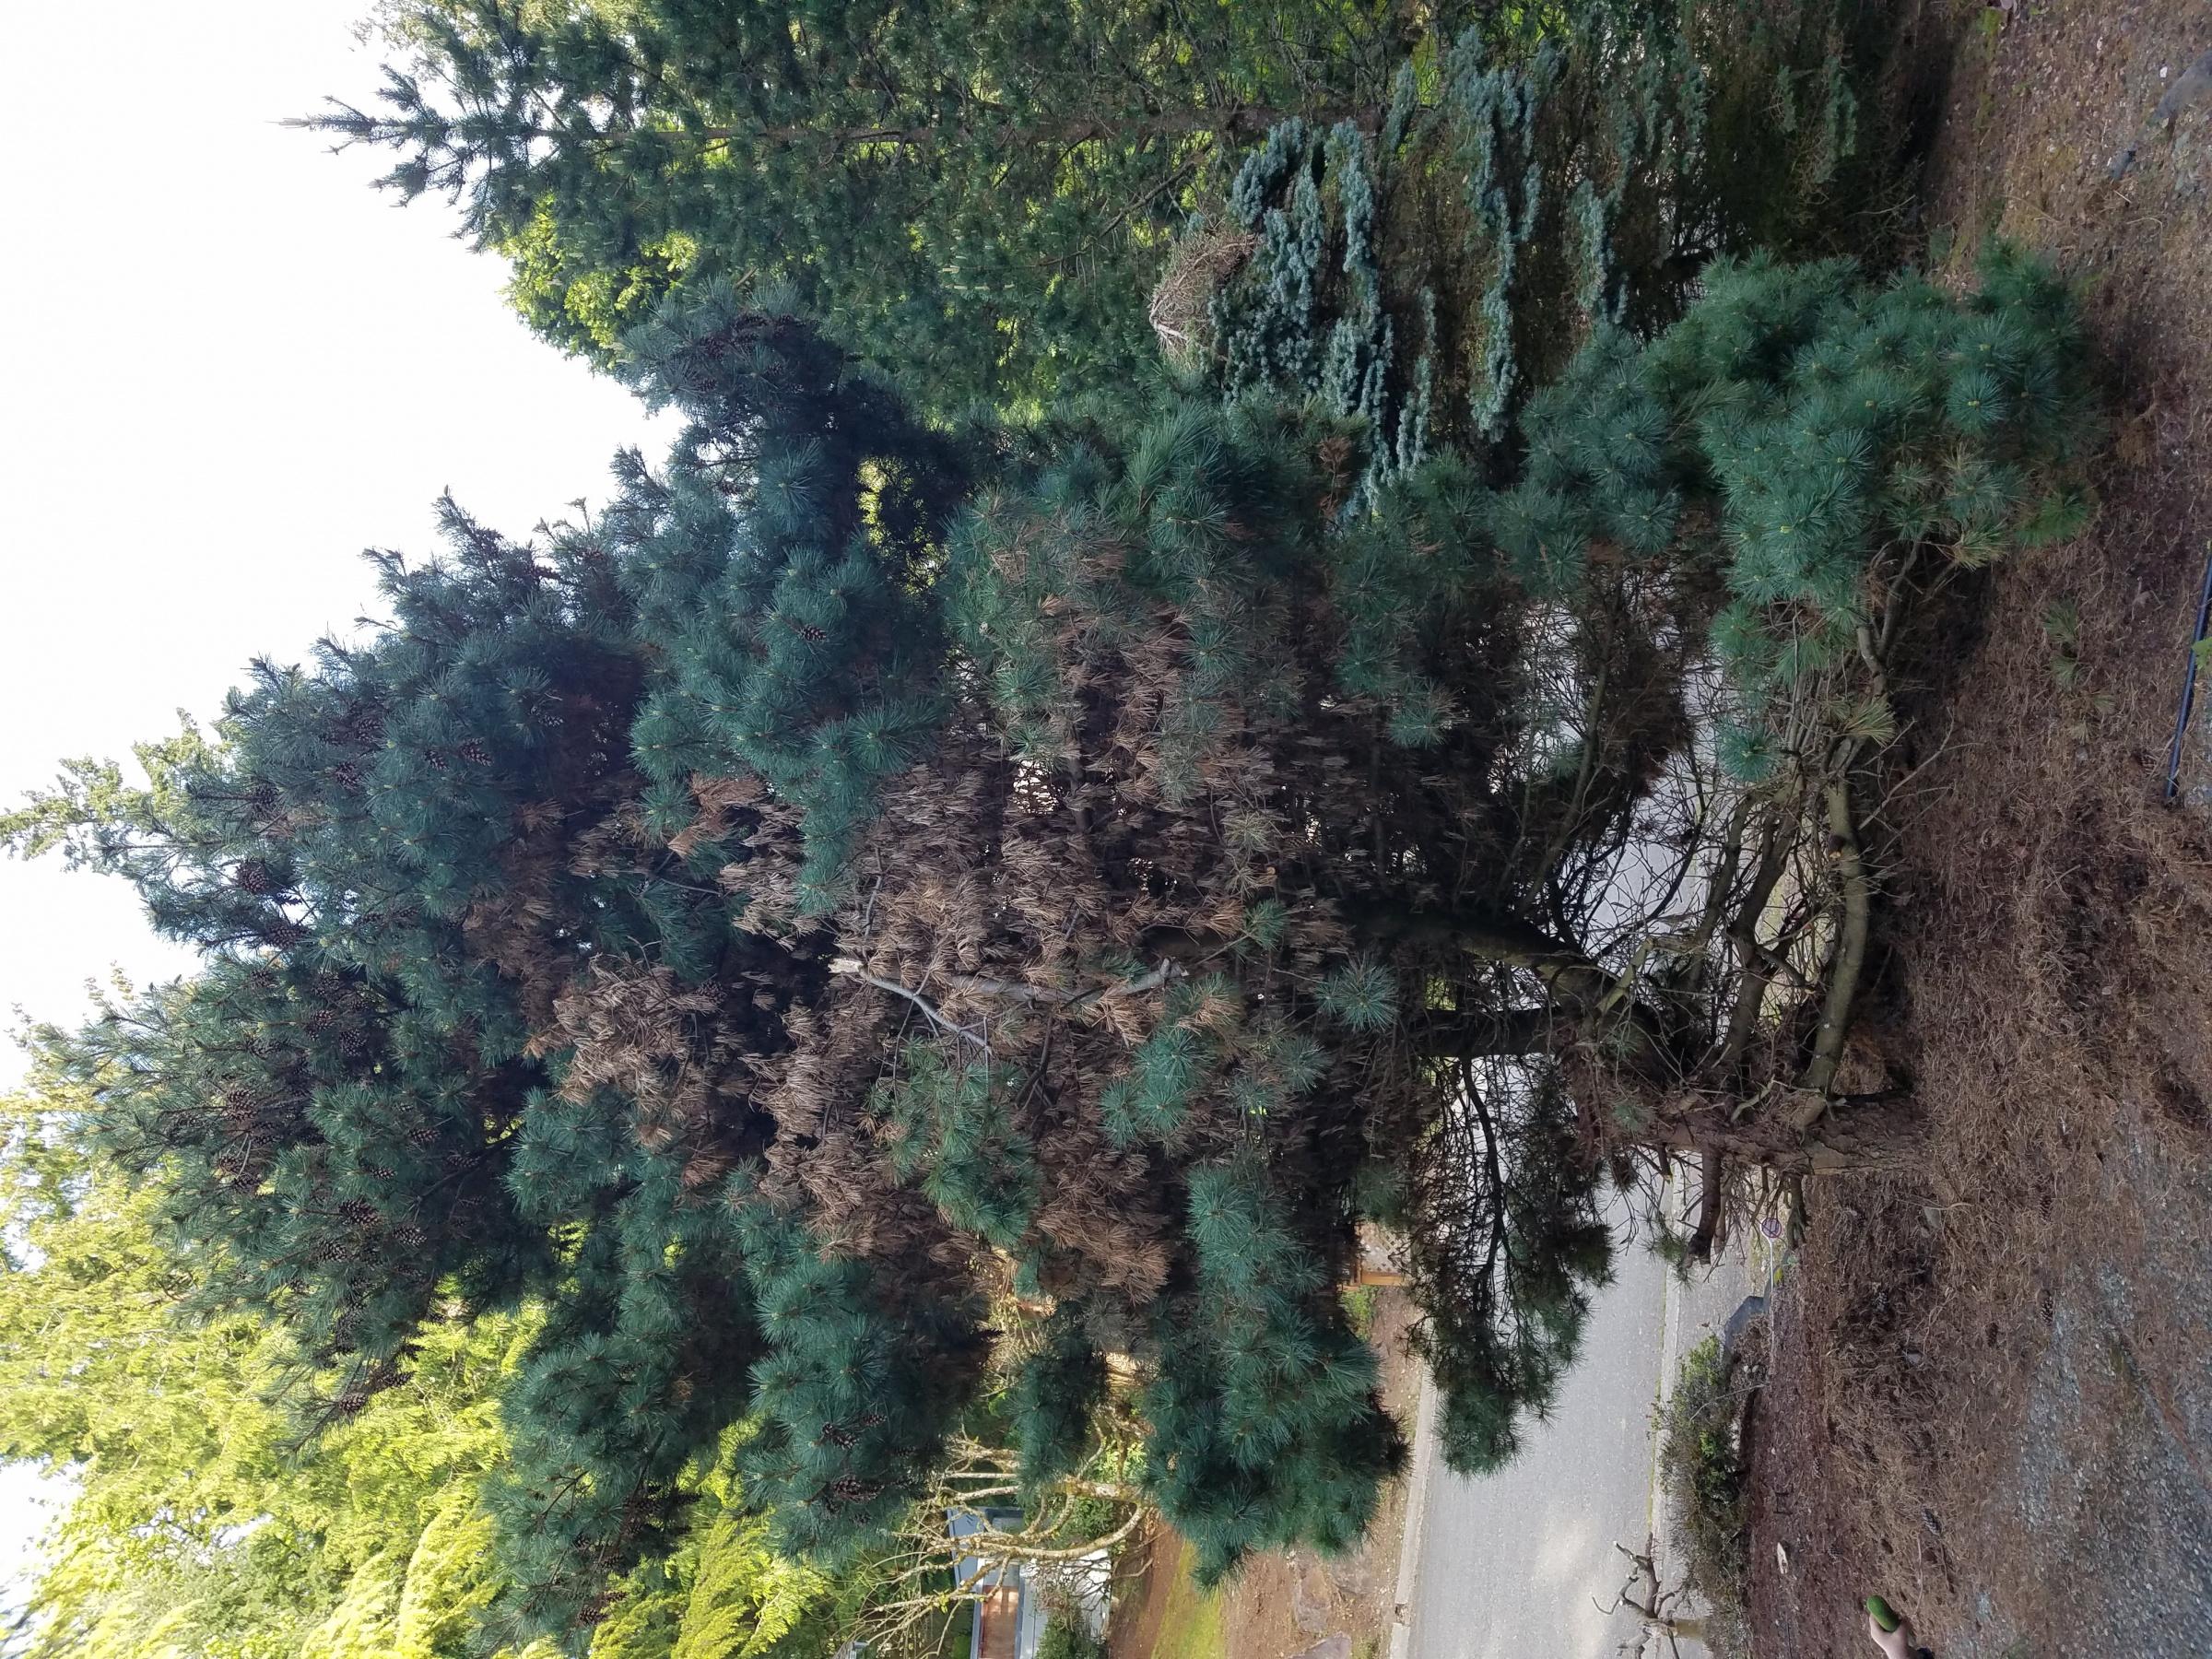 Trim pine tree-20190504_180541.jpg